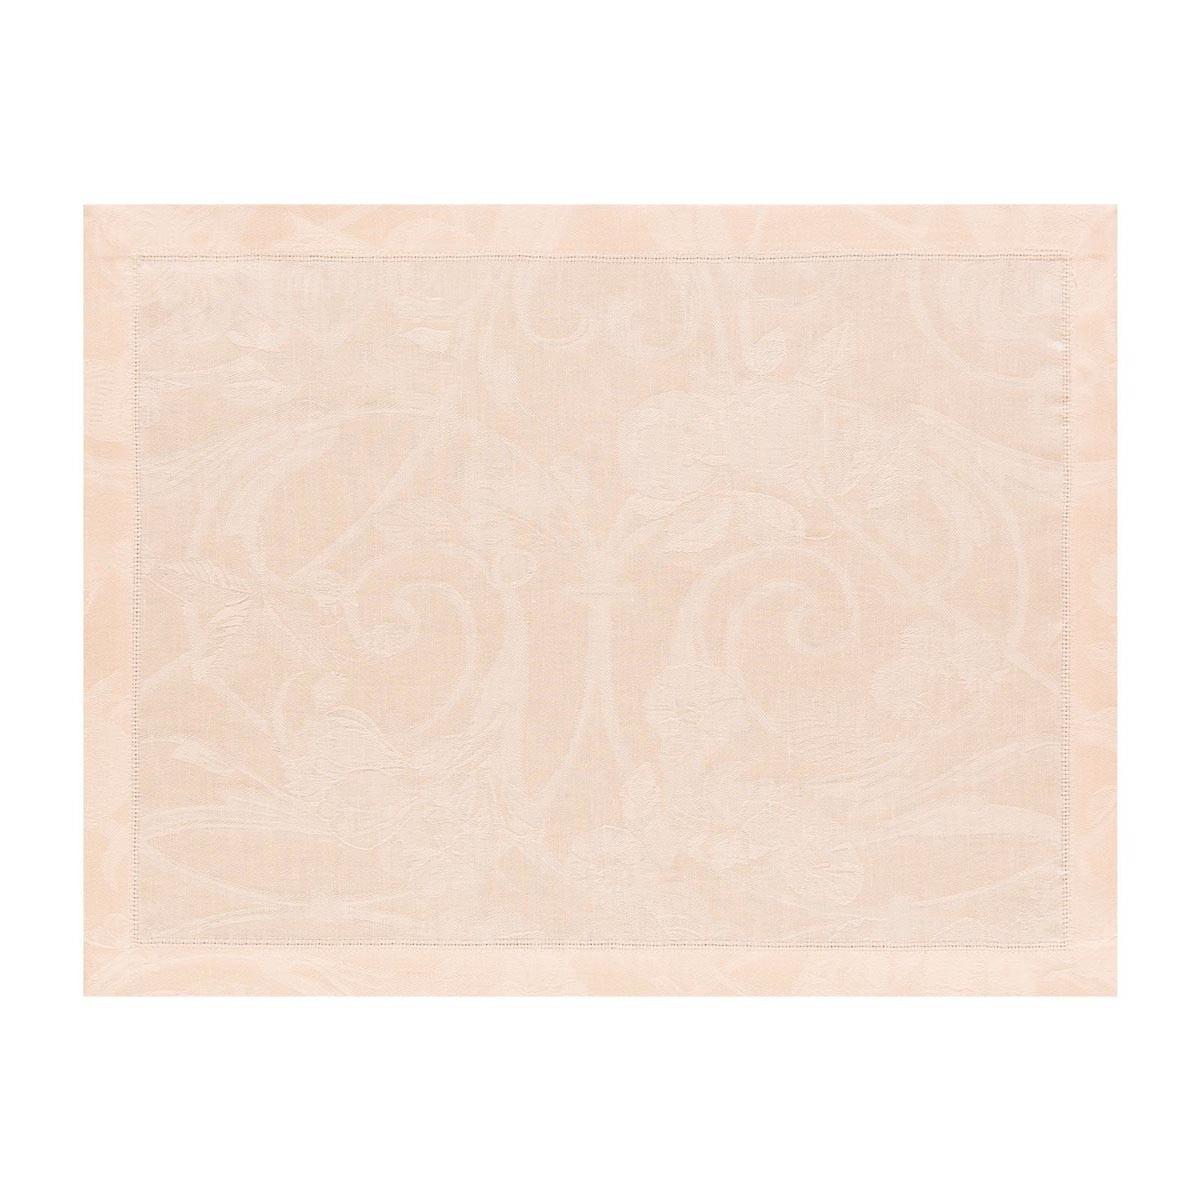 Le Jacquard Francais Tivoli Wheat Placemat 14 x 19 Inch EAN ...